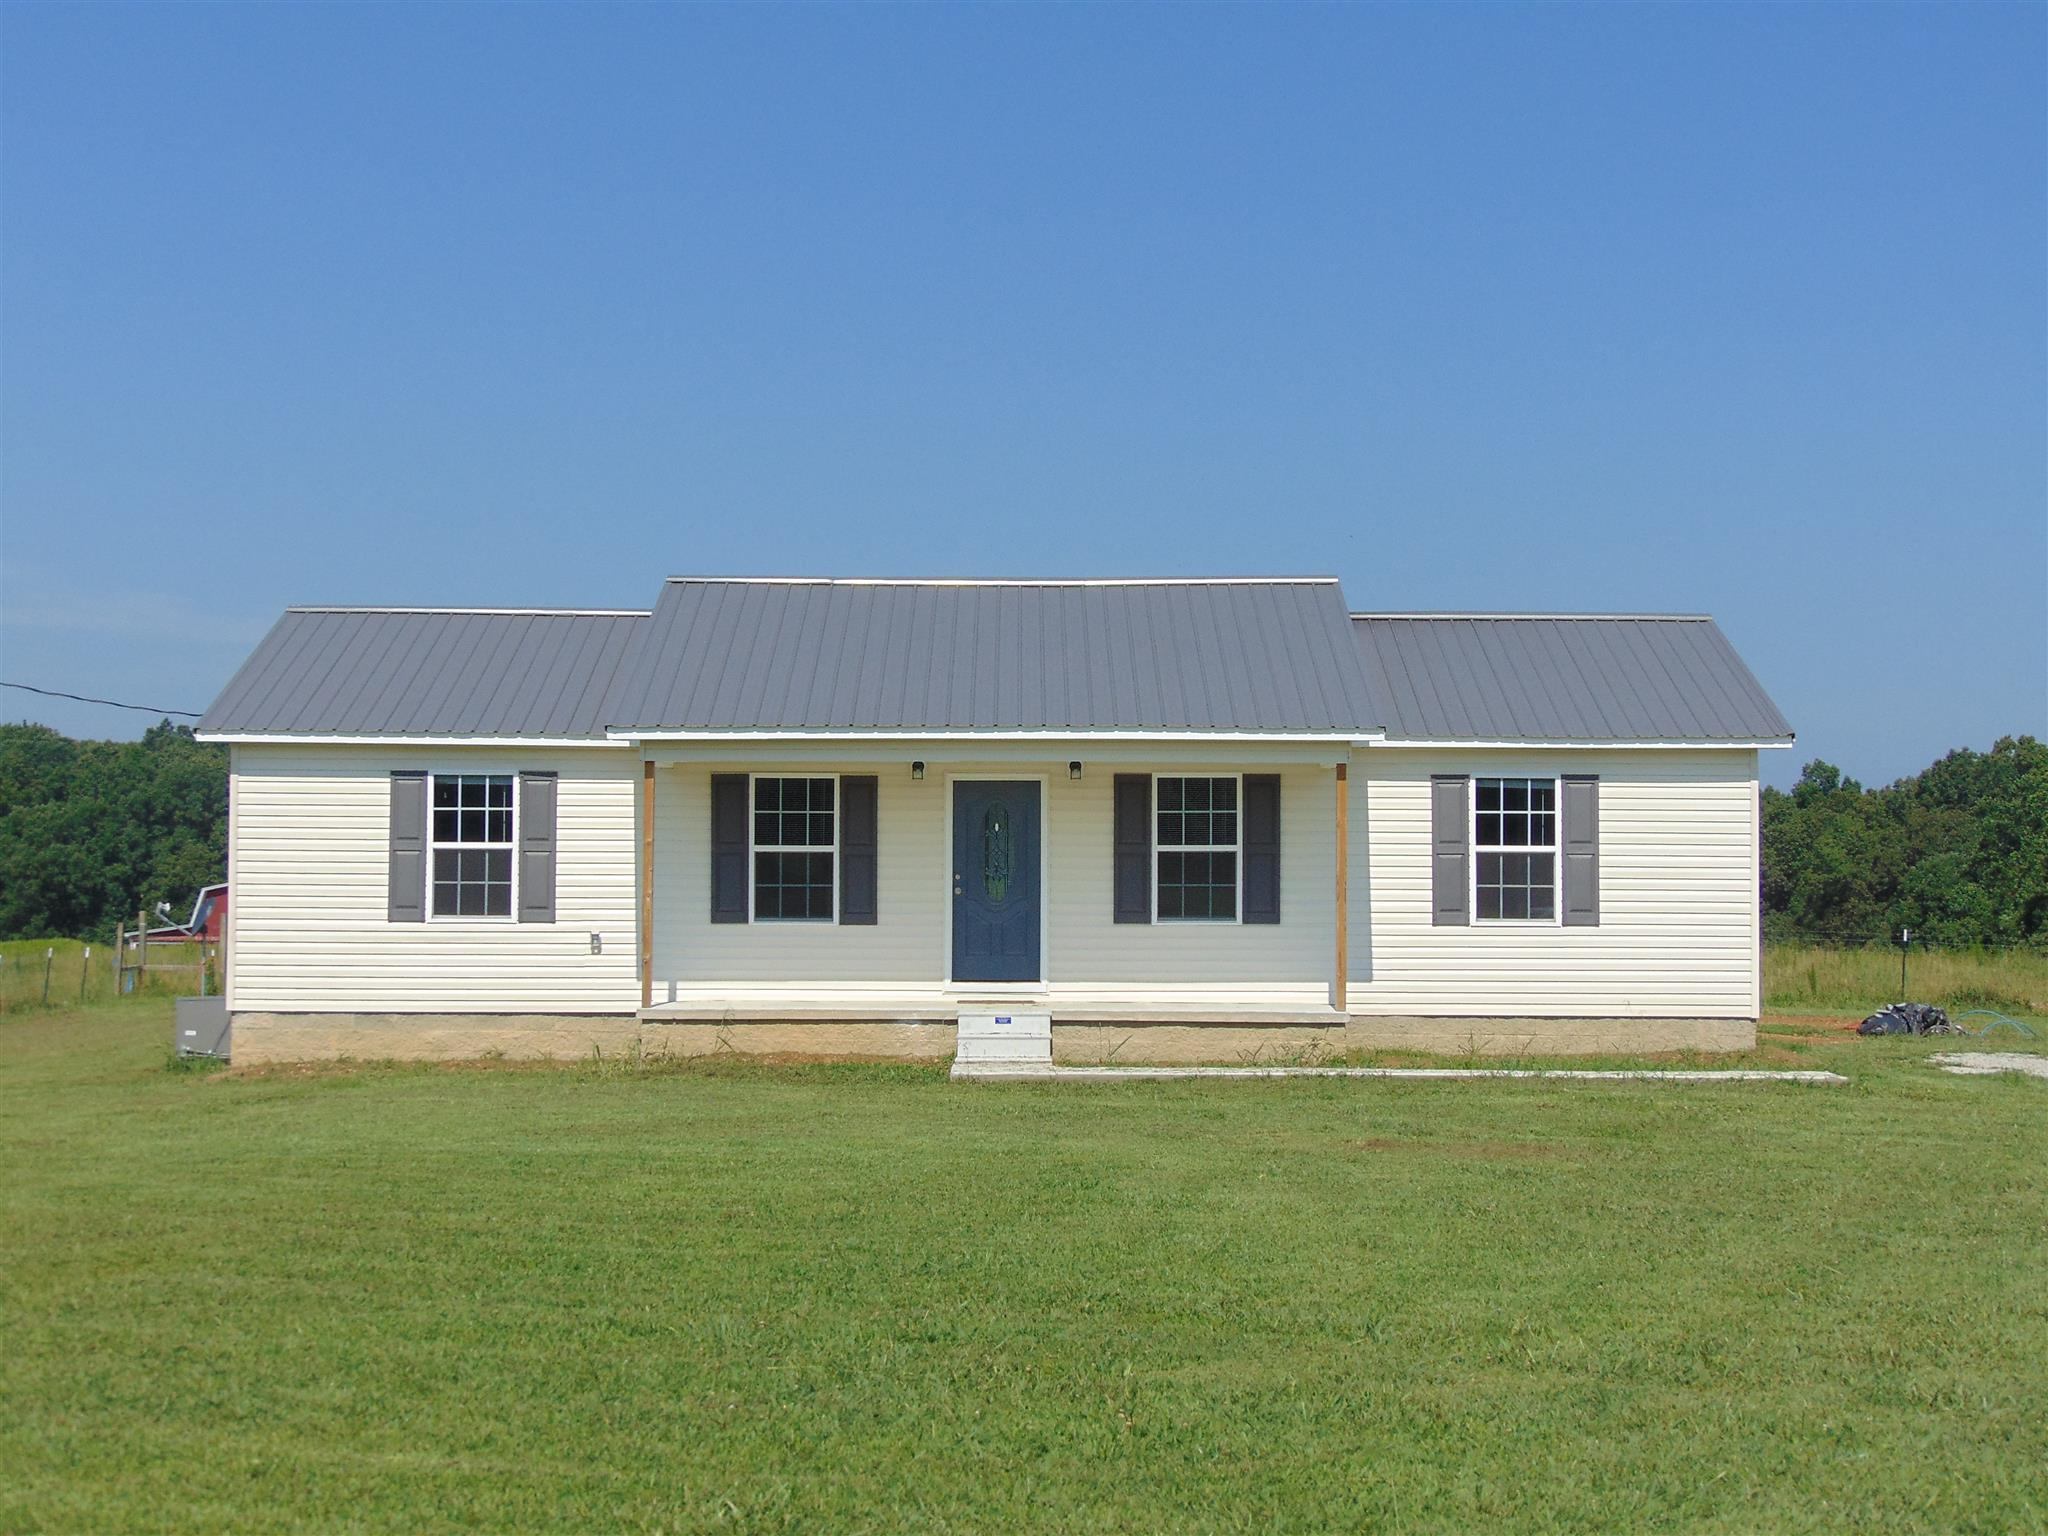 87 Locker Rd, Summertown, TN 38483 - Summertown, TN real estate listing